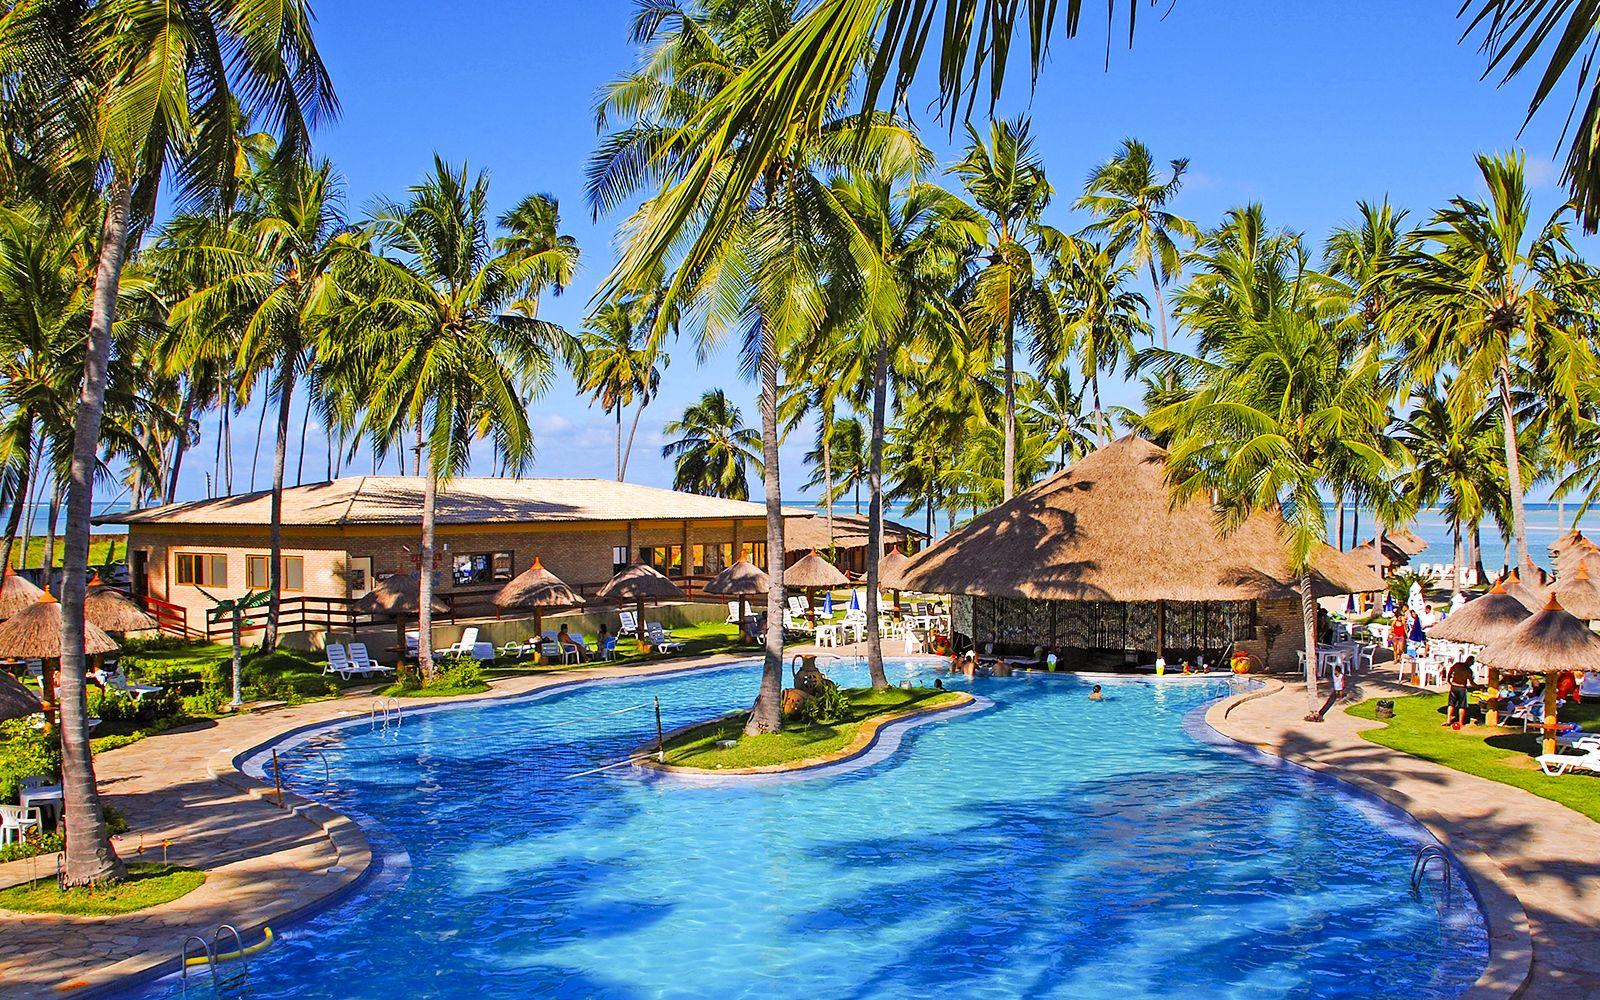 Grand-Oca-Maragogi-Resort-0001